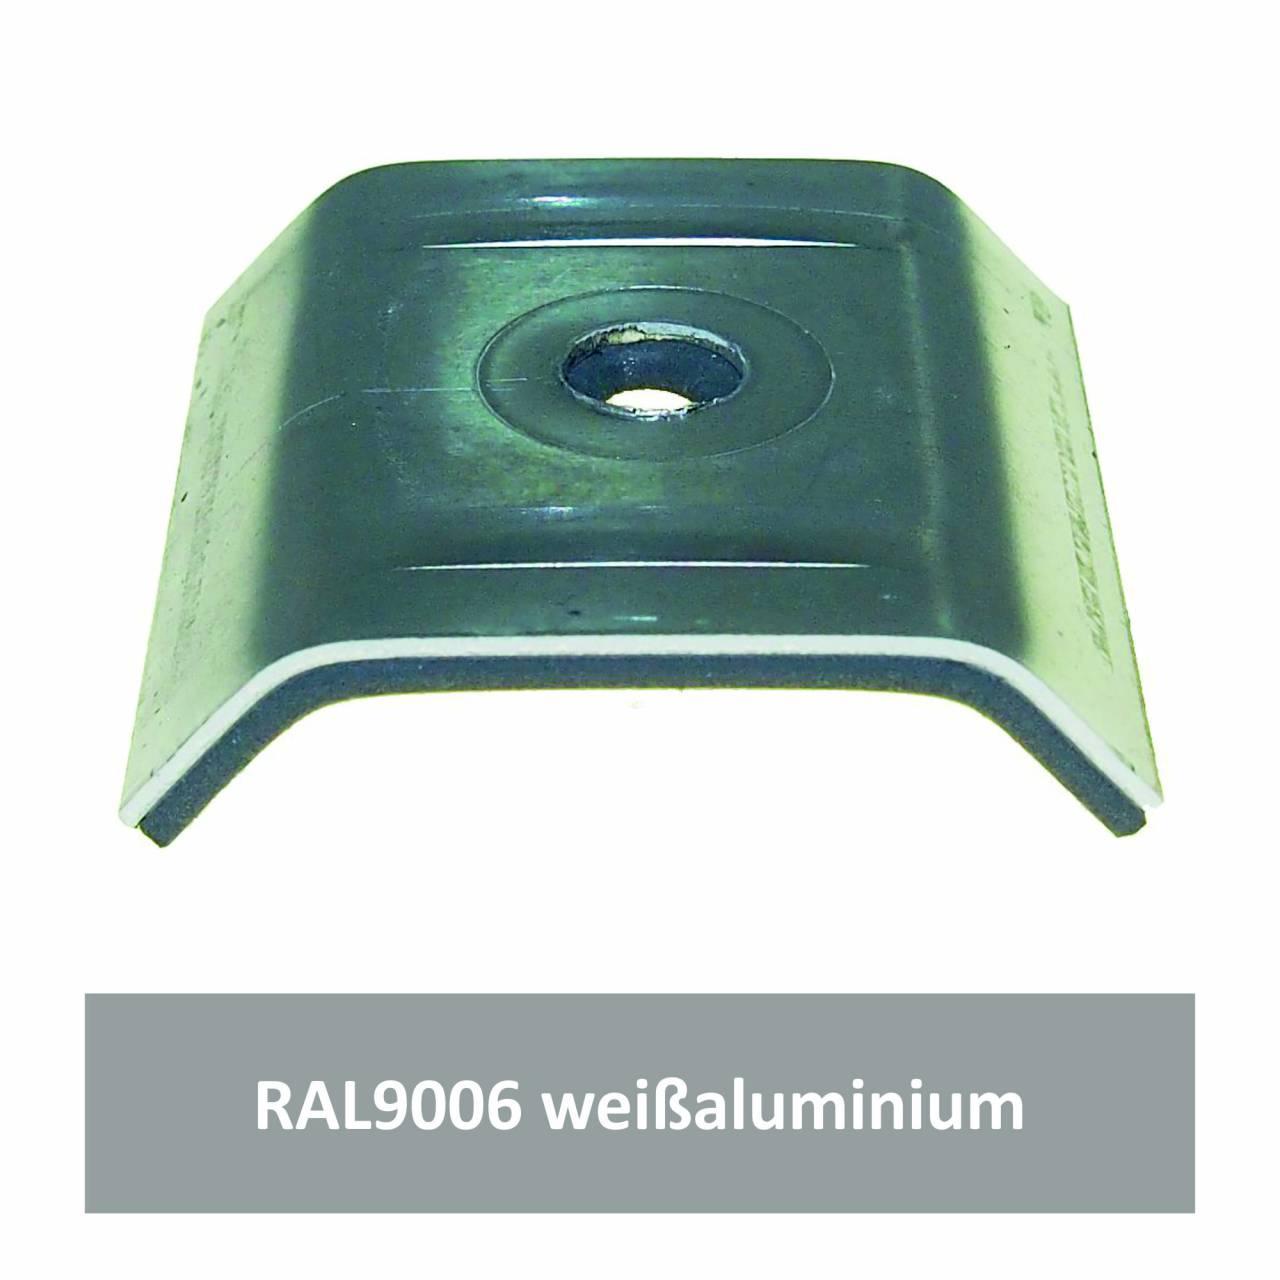 Kalotten für 39/333, Alu RAL9006 weißaluminium / Pck a 100 Stück